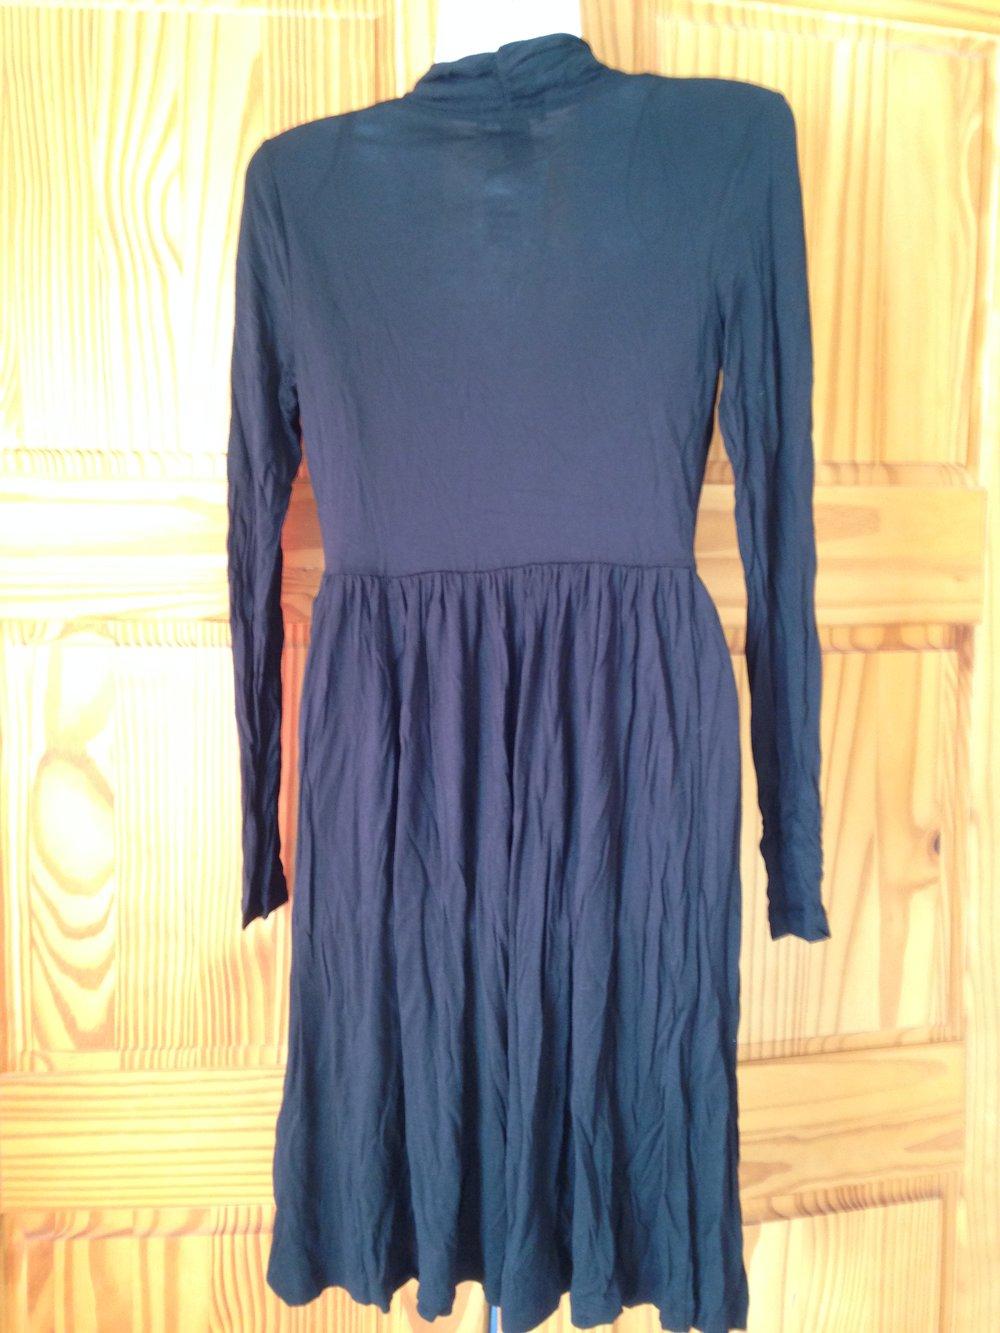 H&M Kleid, Abendkleid, Cocktailkleid, Shirt :: Kleiderkorb.de